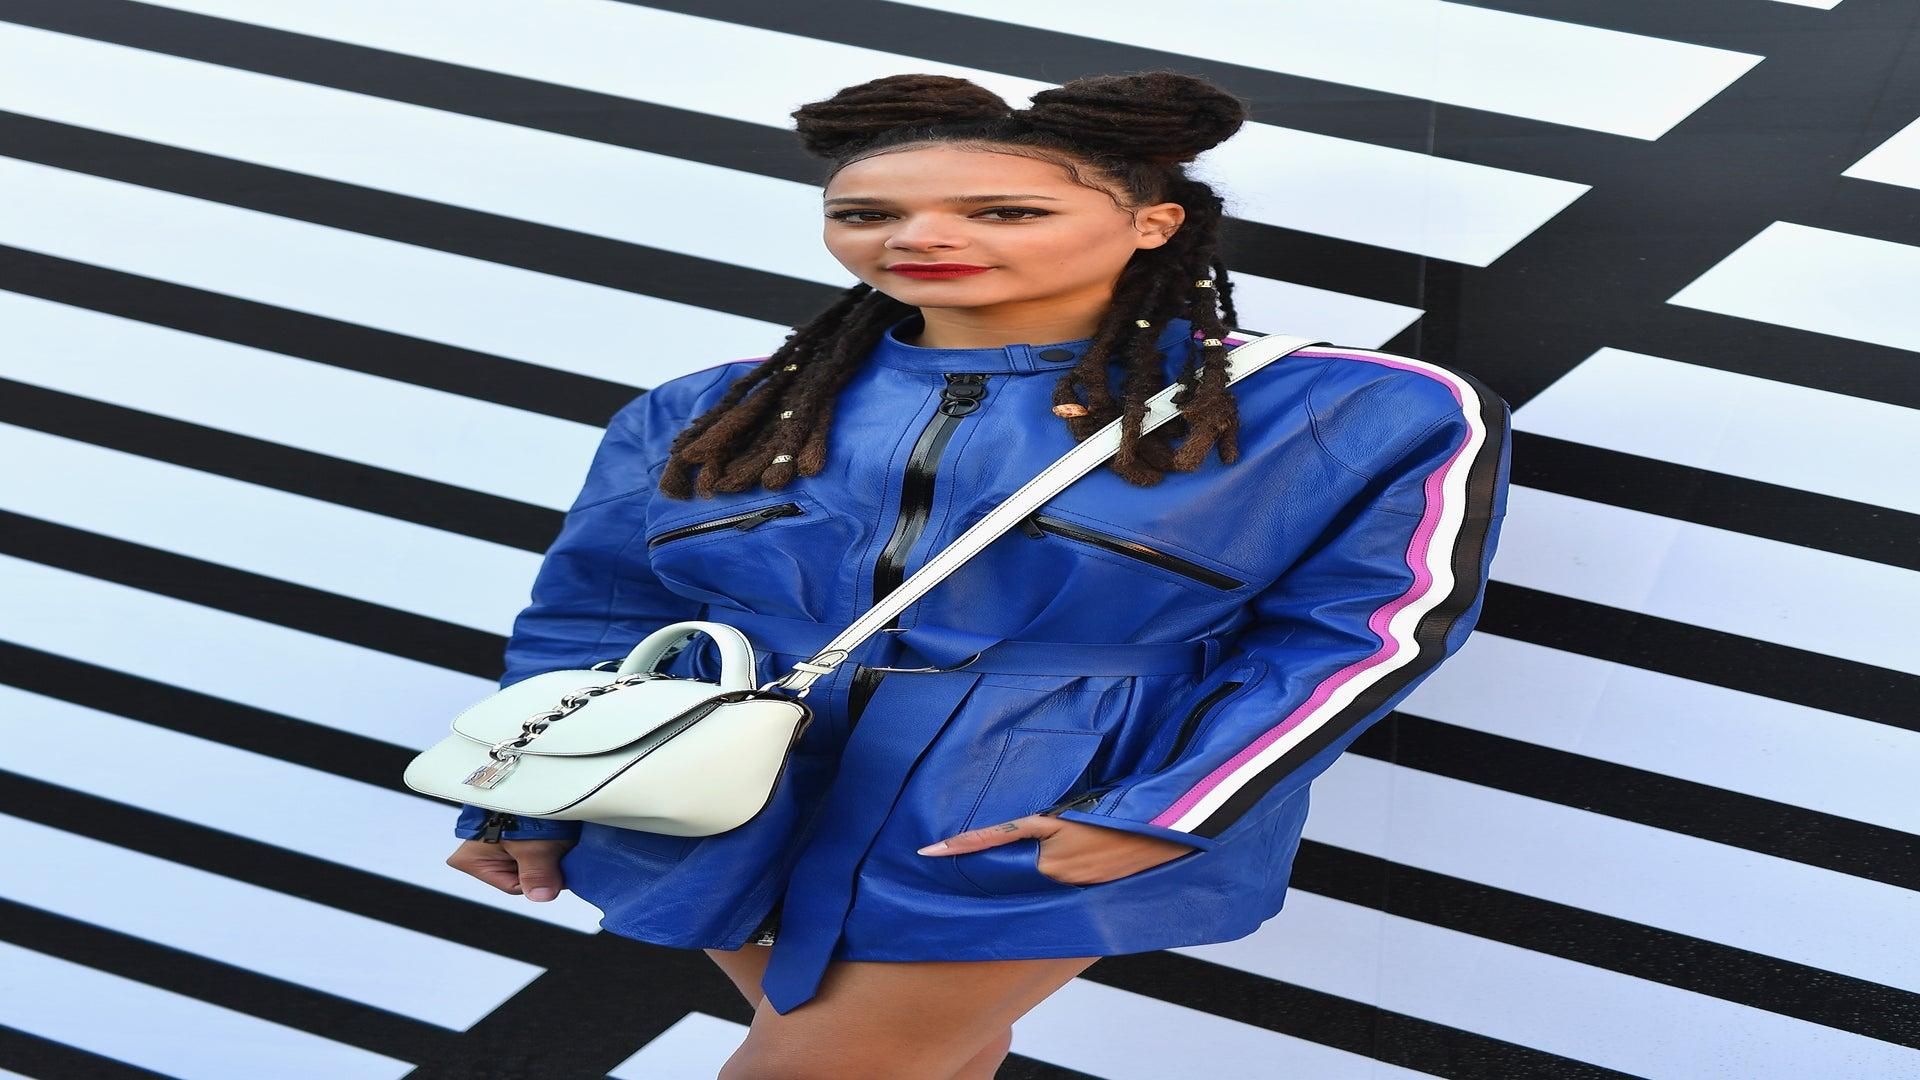 14 Photos That Explain Why Sasha Lane is Louis Vuitton's Newest Face